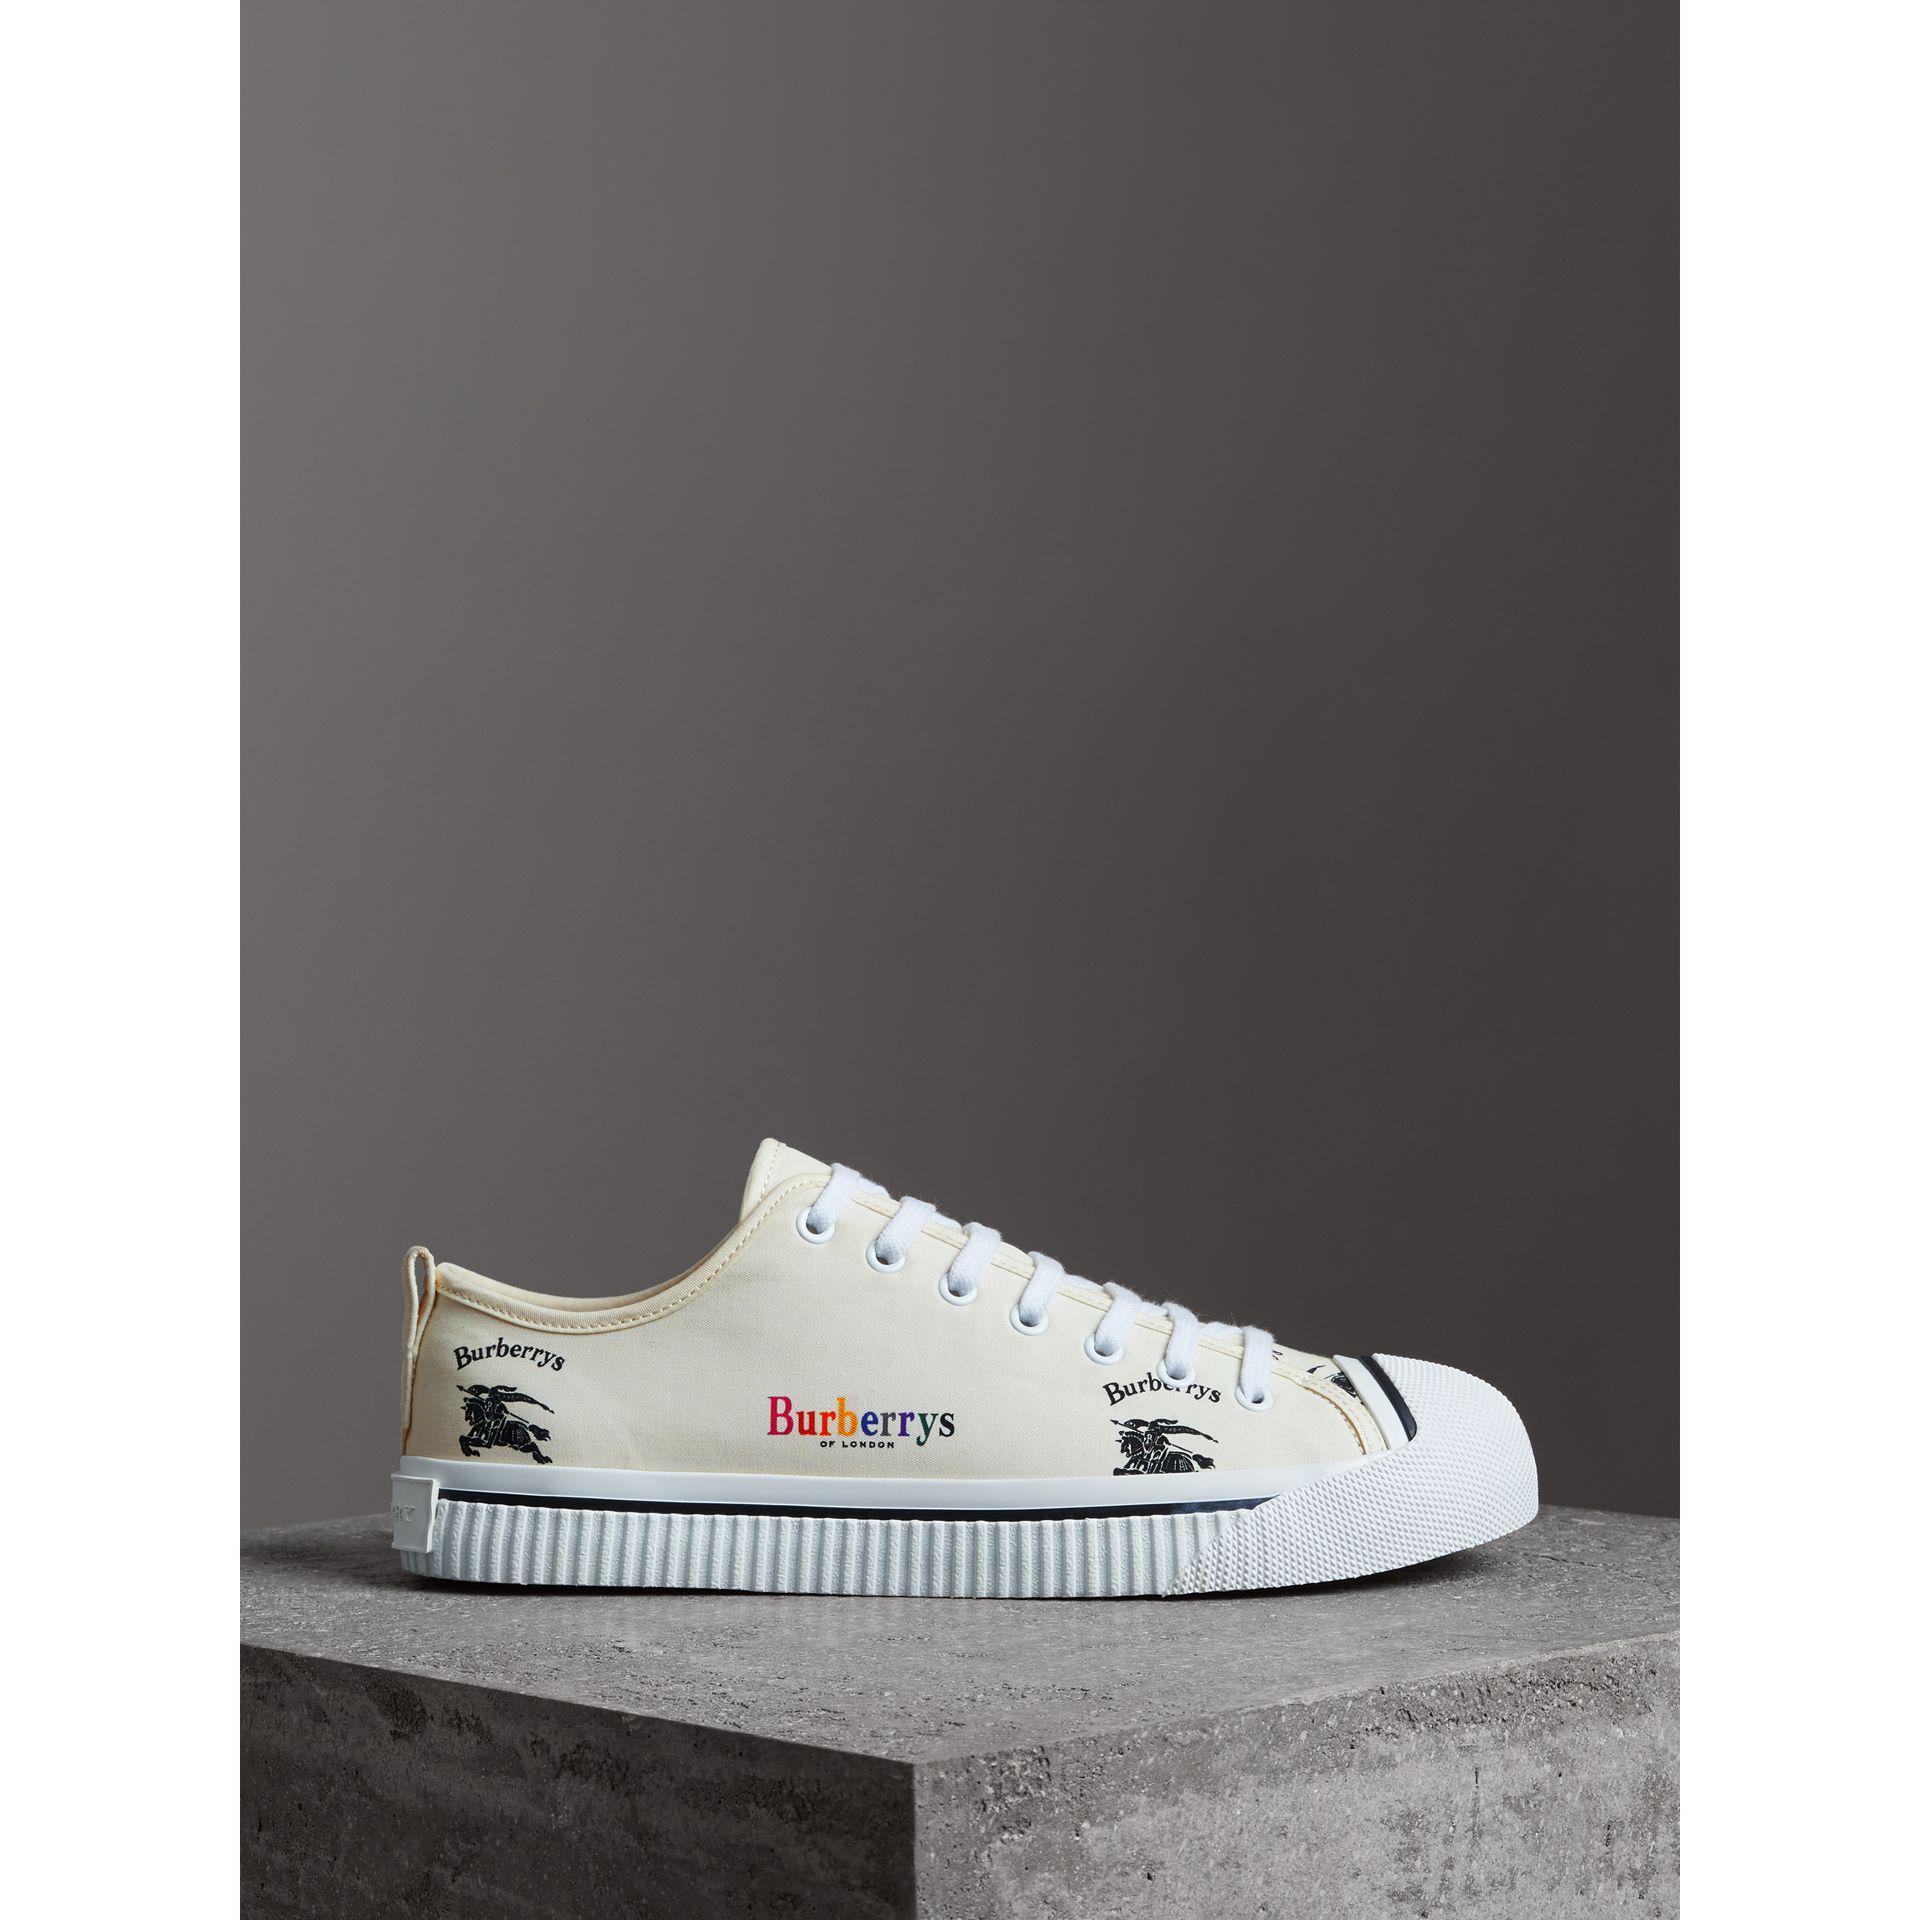 buy online 789b7 b4cca burberry-OFF-WHITE-Archive-Logo-Cotton-Gabardine-Sneakers.jpeg